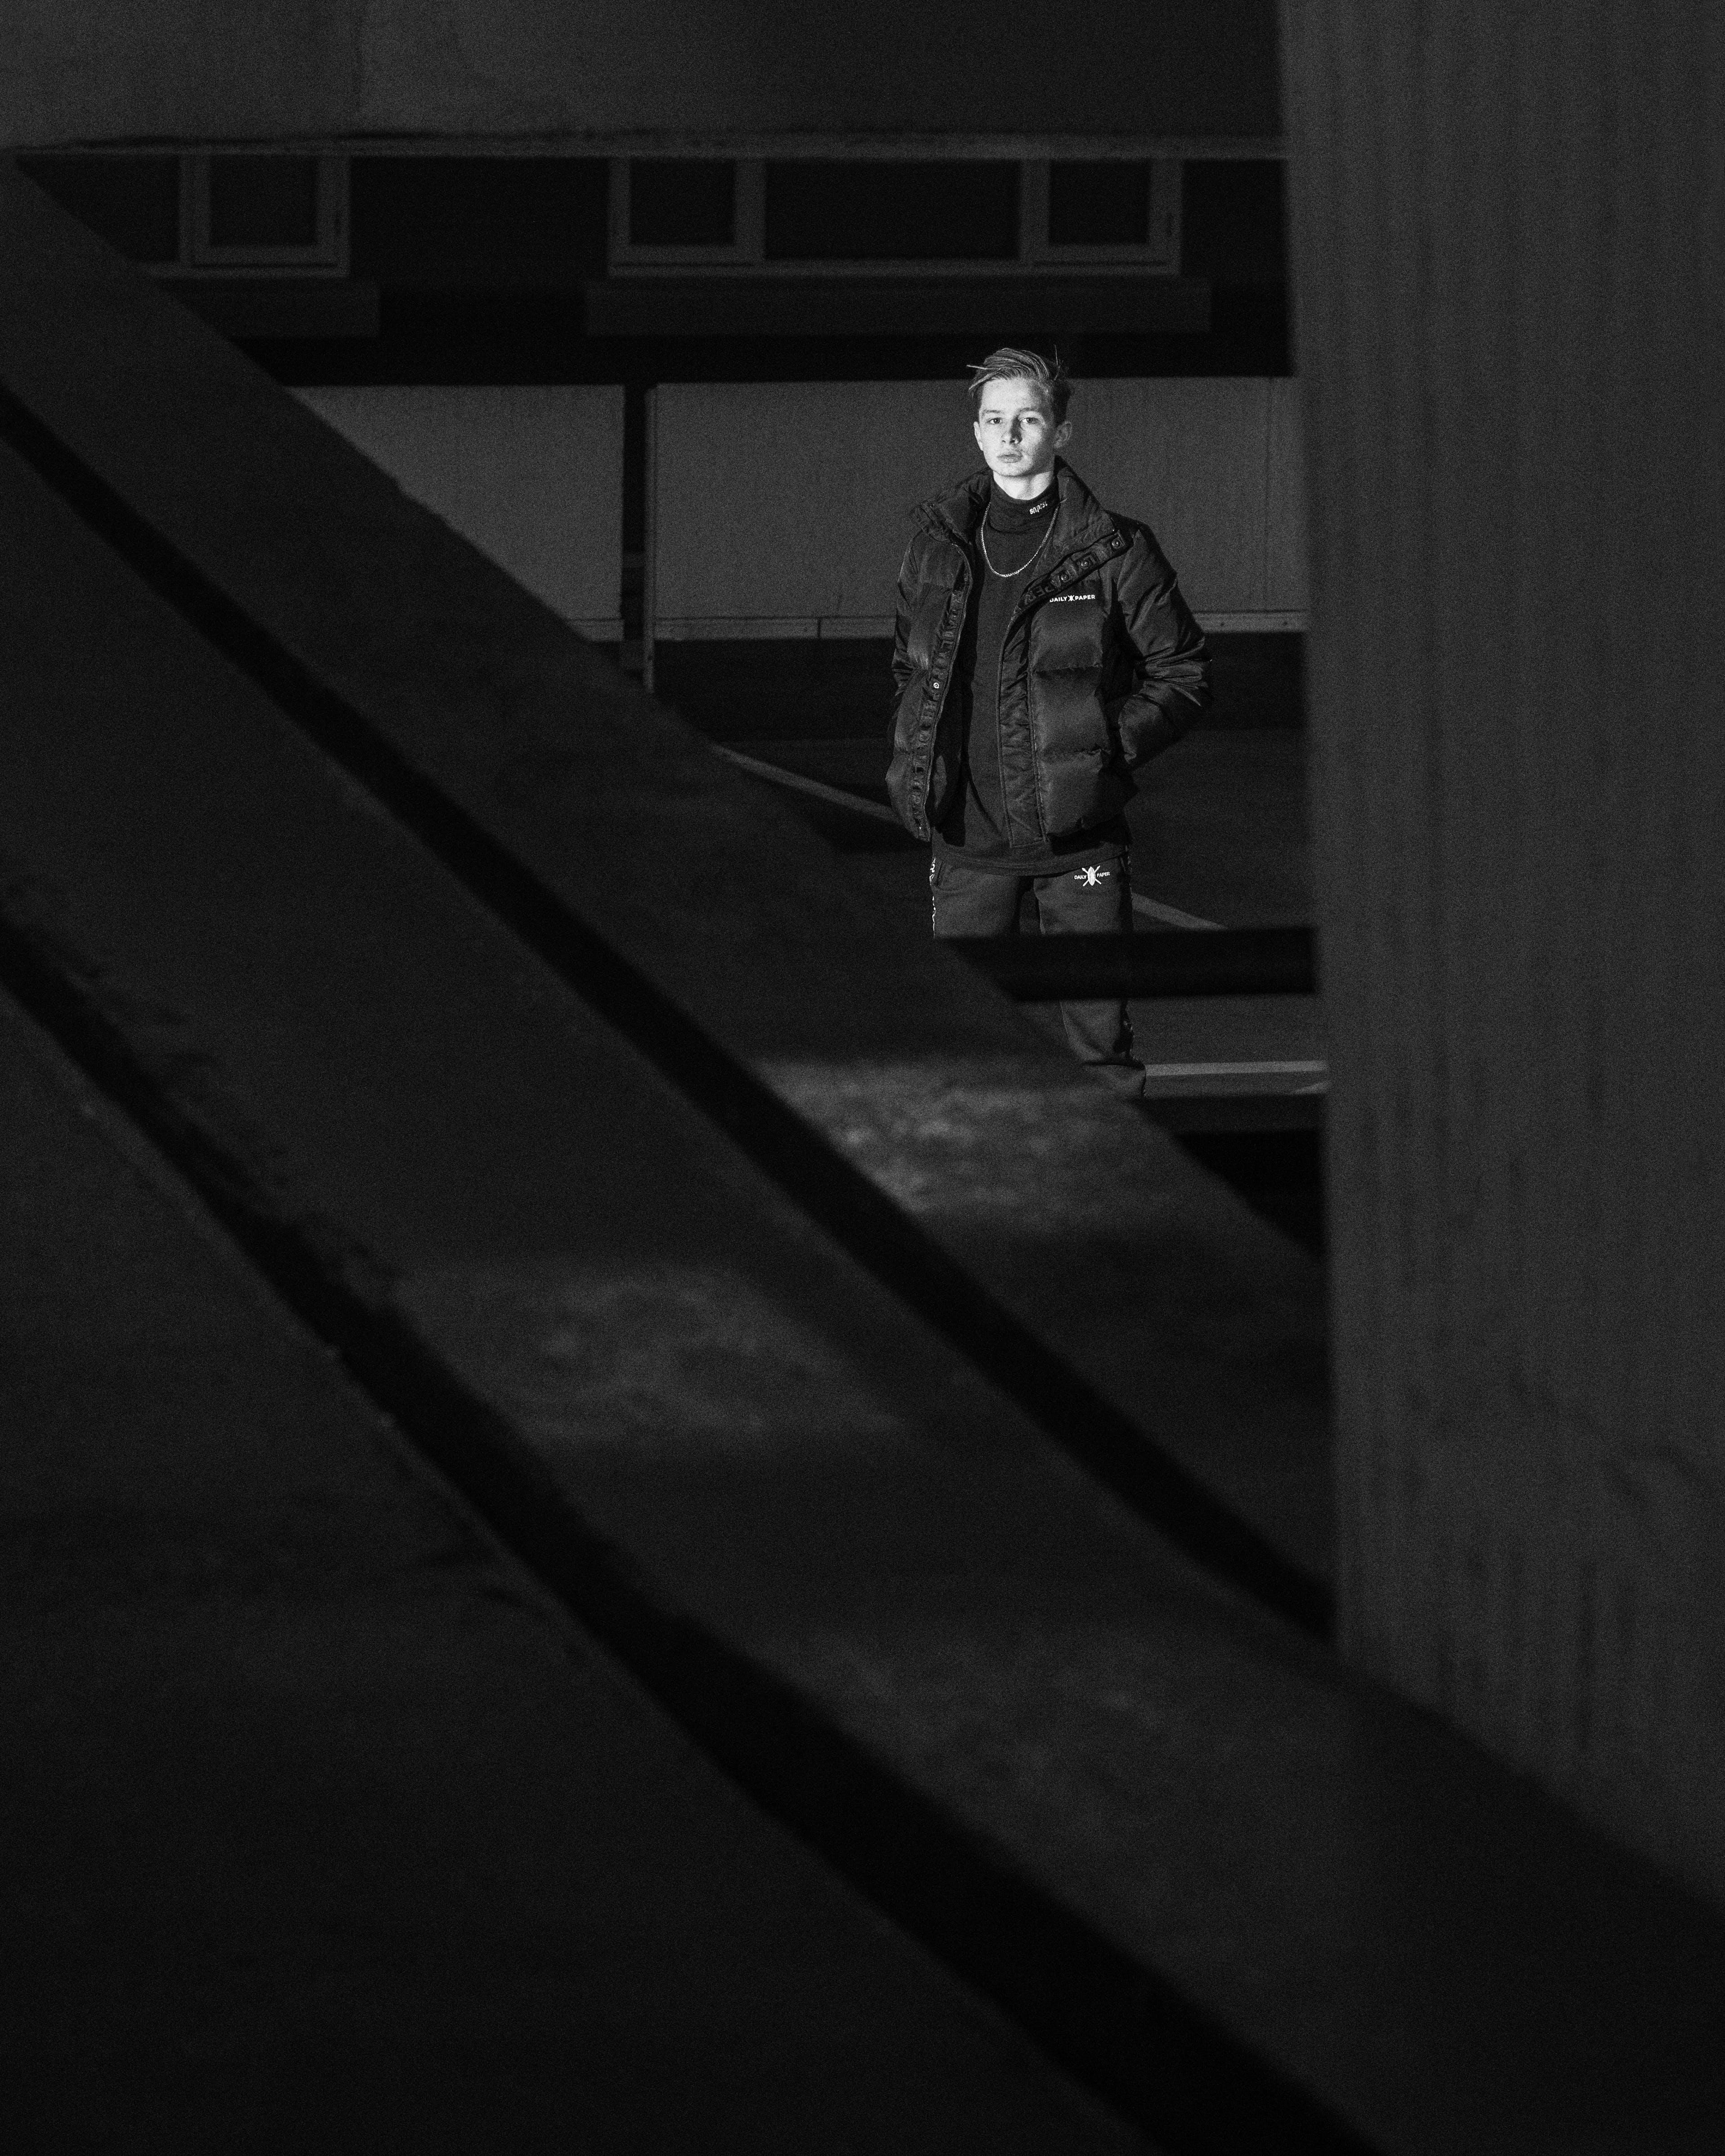 Free stock photo of black and white, night, person, urban